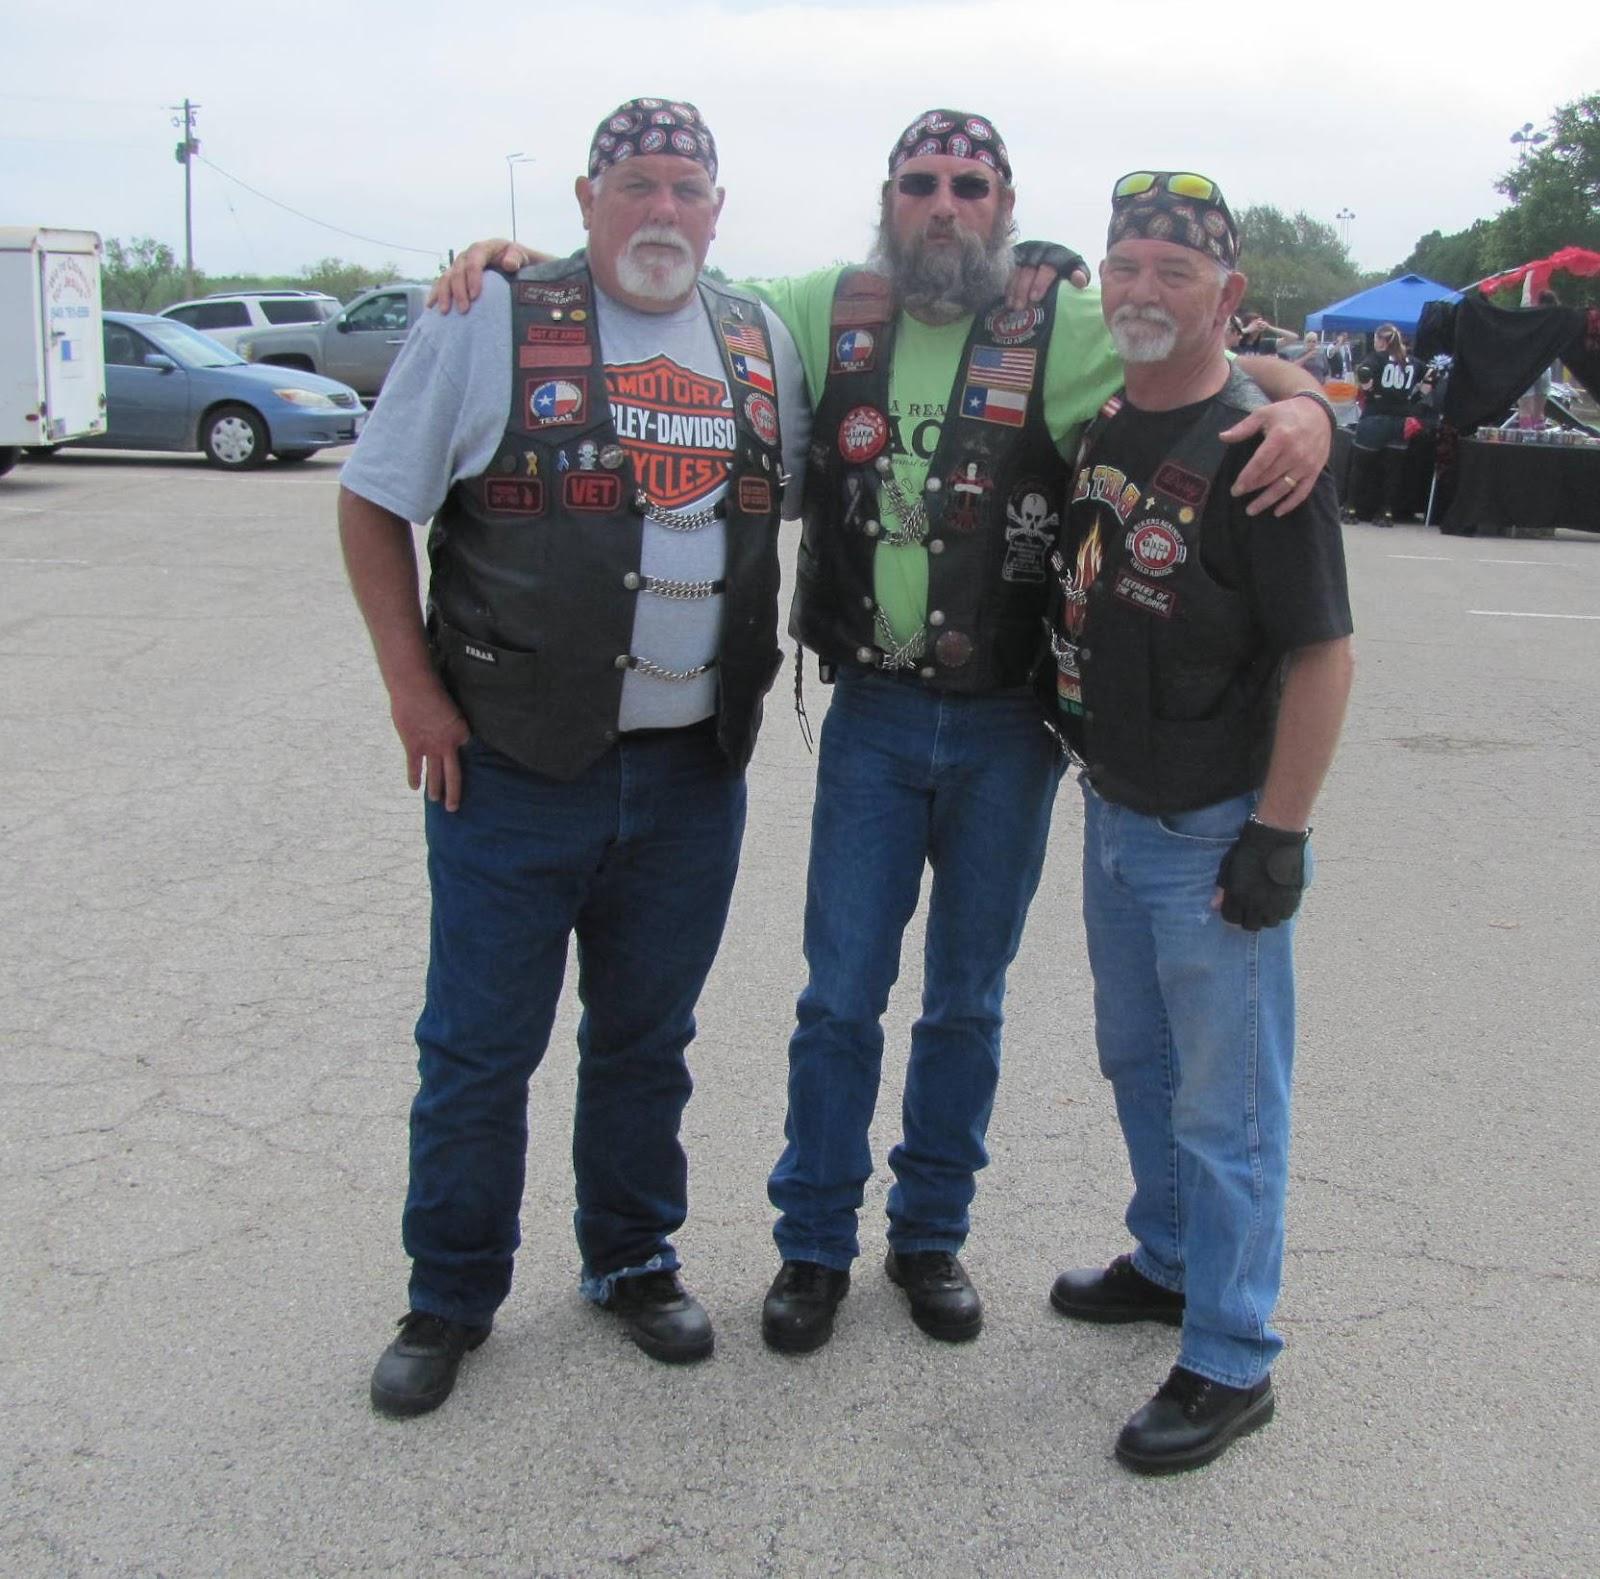 North texas bikers v feel the heat biker chili cook off 3 for Tattoo shops in wichita falls tx